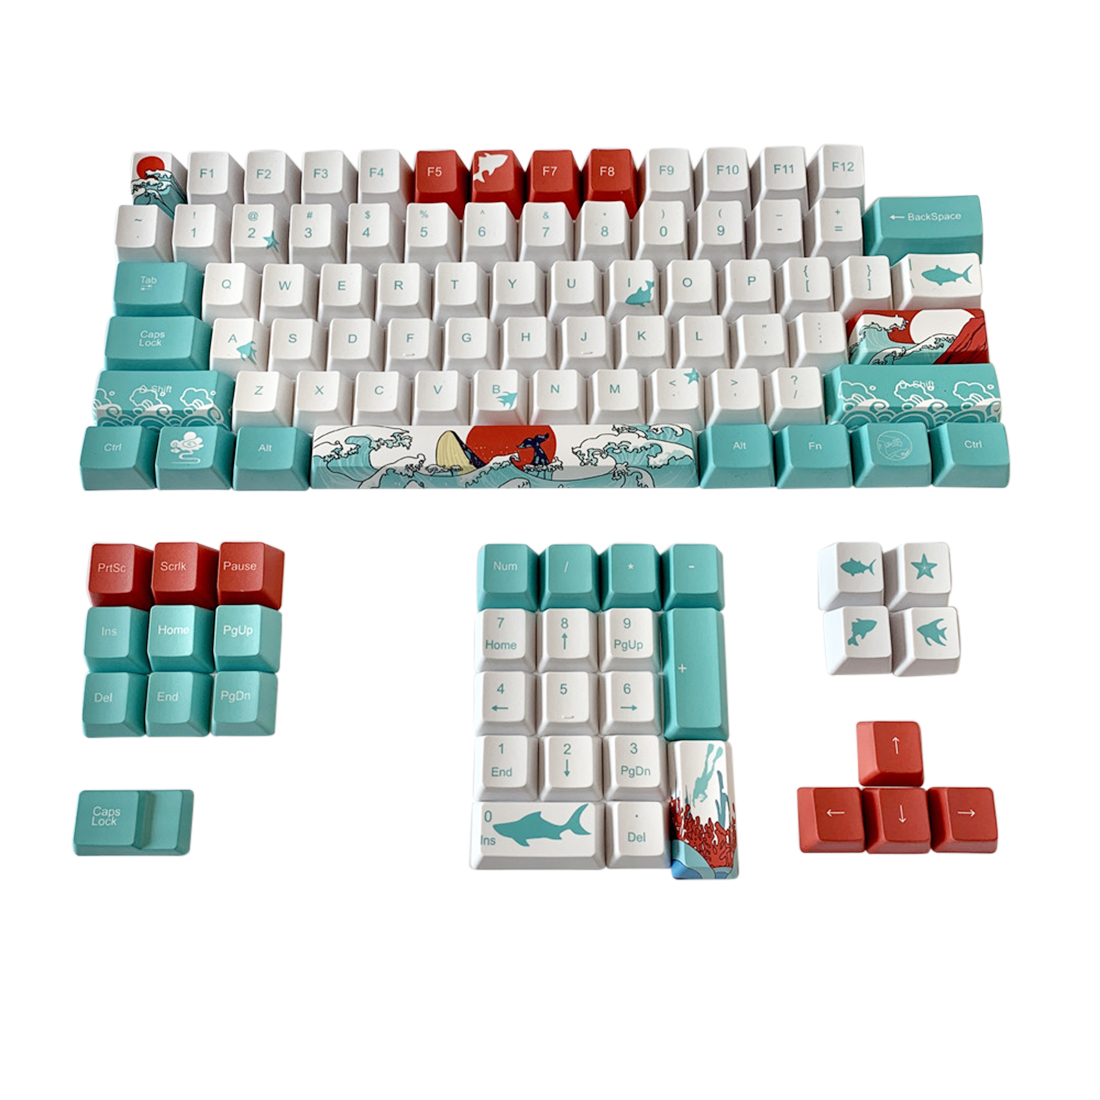 108pcs Coral Sea Keycaps Set OEM Profile PBT Dye-sub for for GK64/GH60/68F11 Custom Gaming Mechanical Keyboard